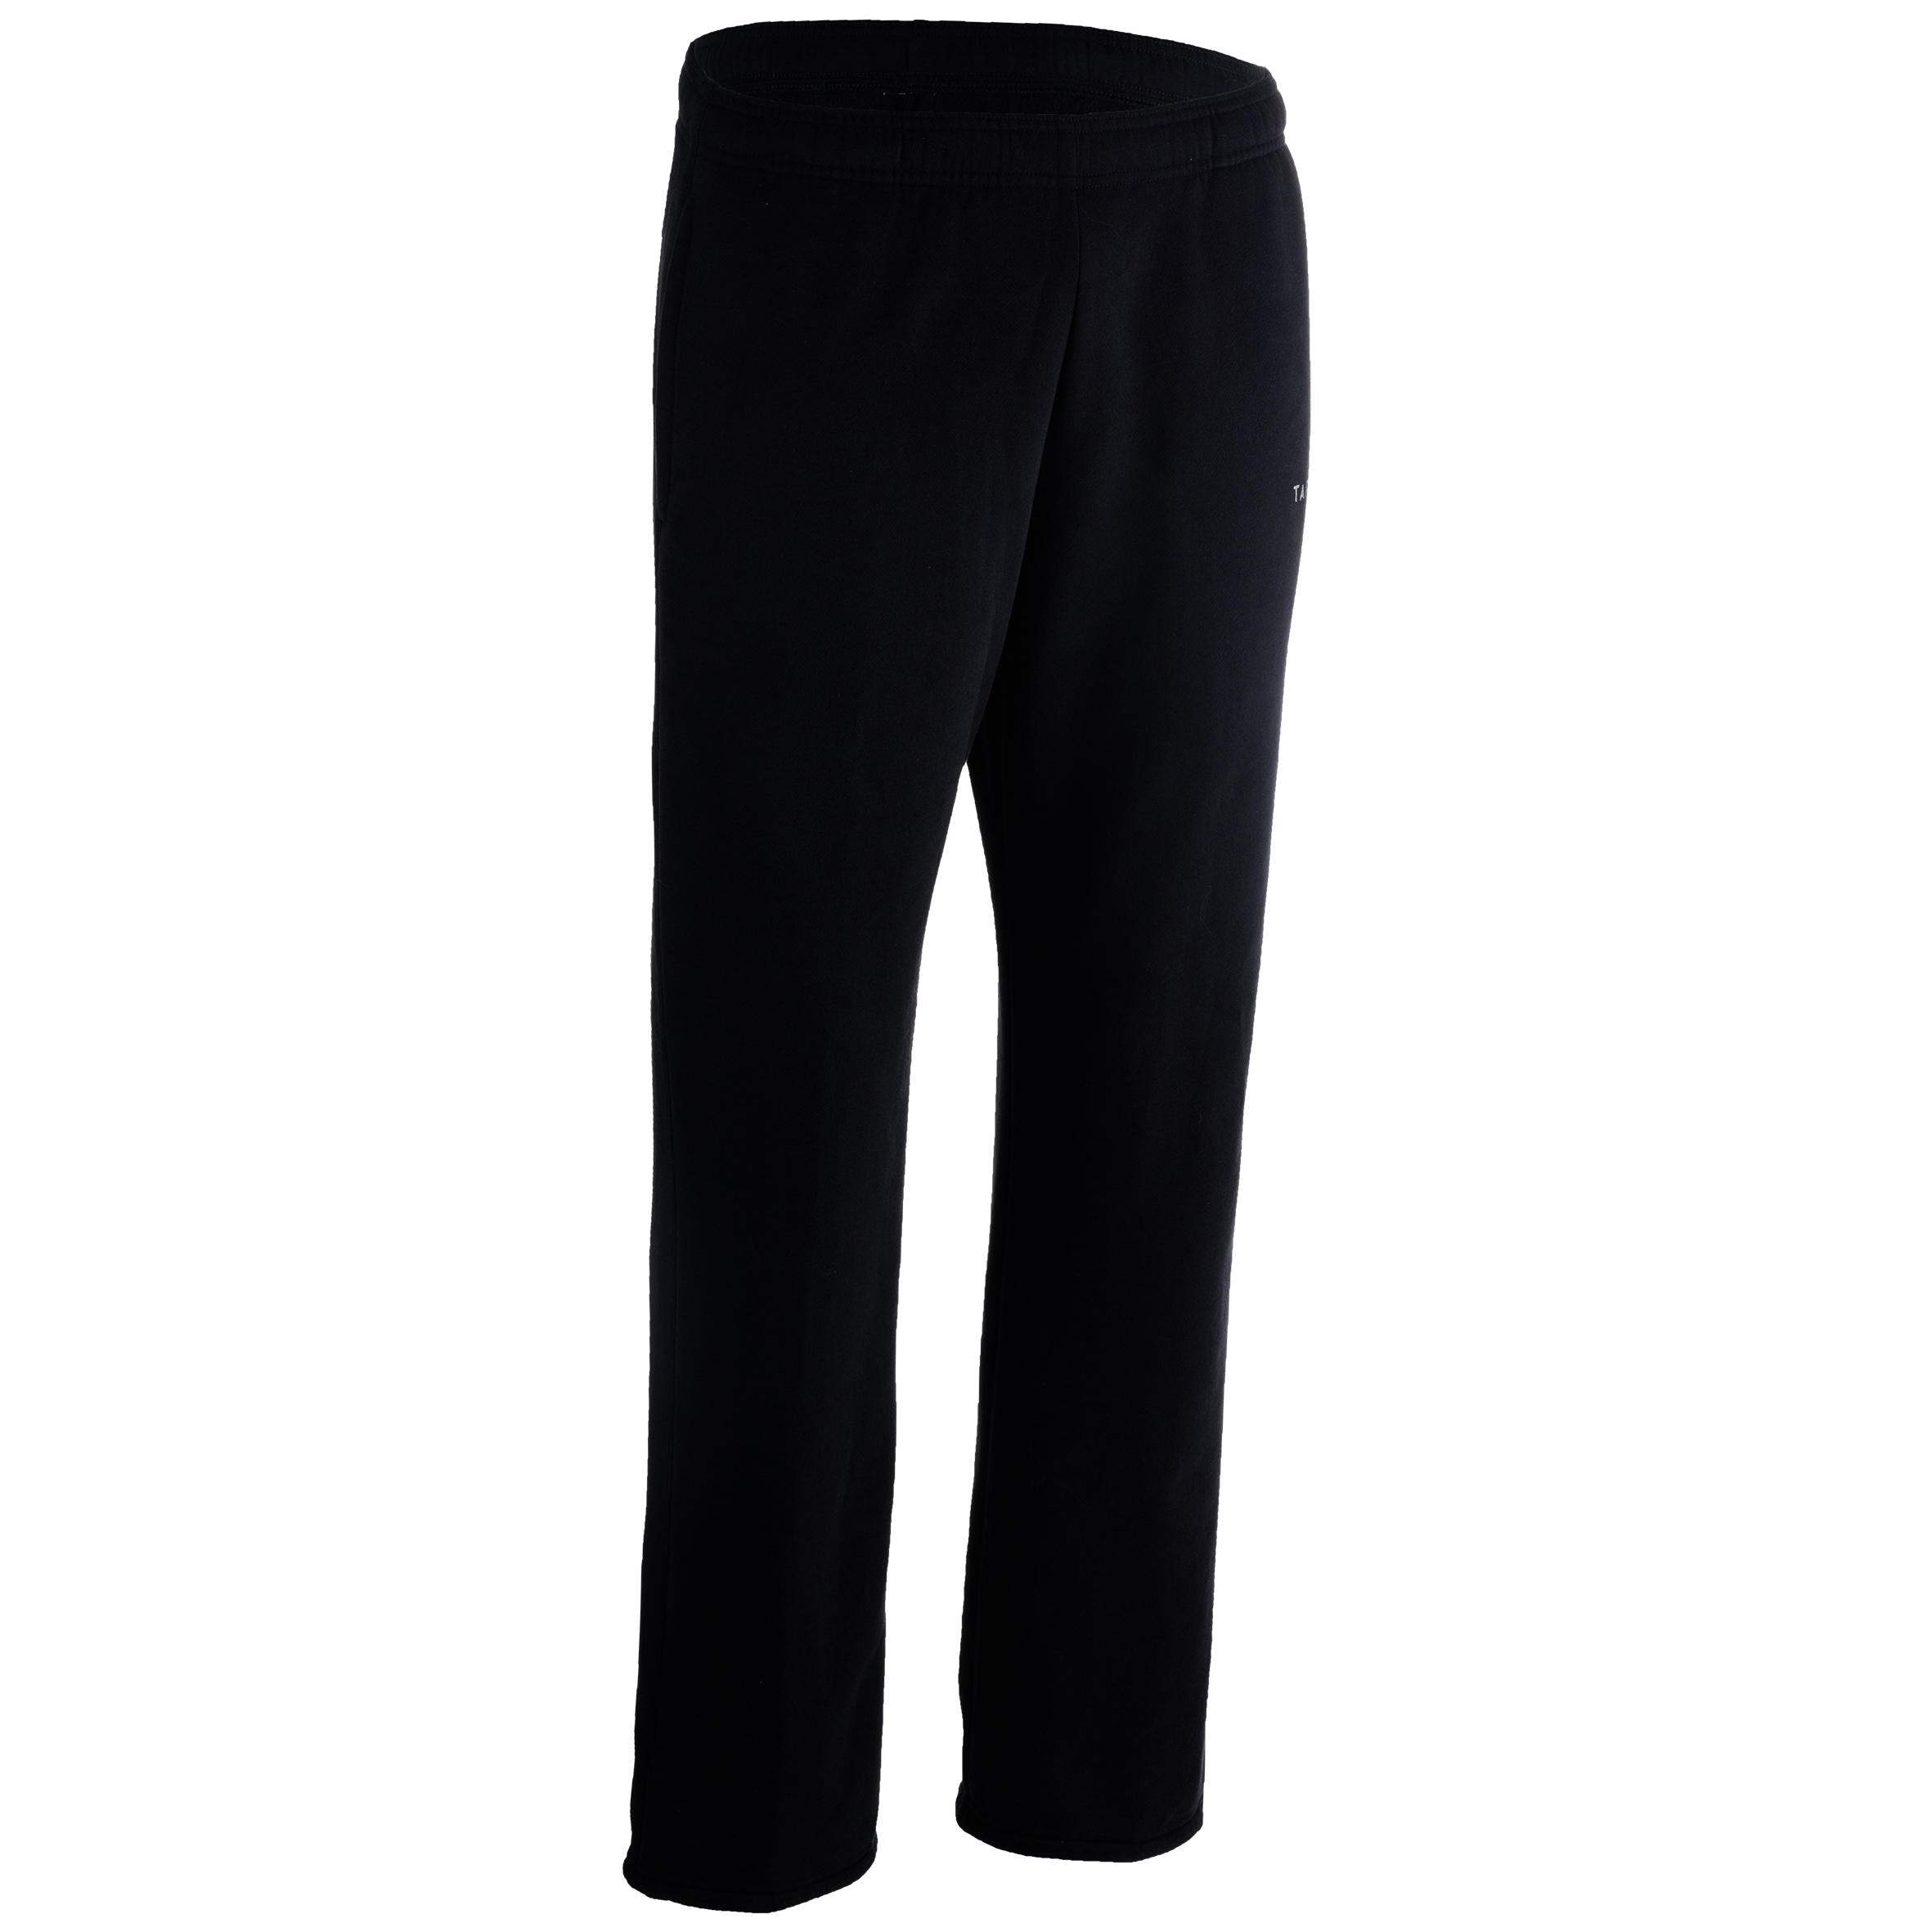 Pantalon Baschet P100 Bărbați imagine